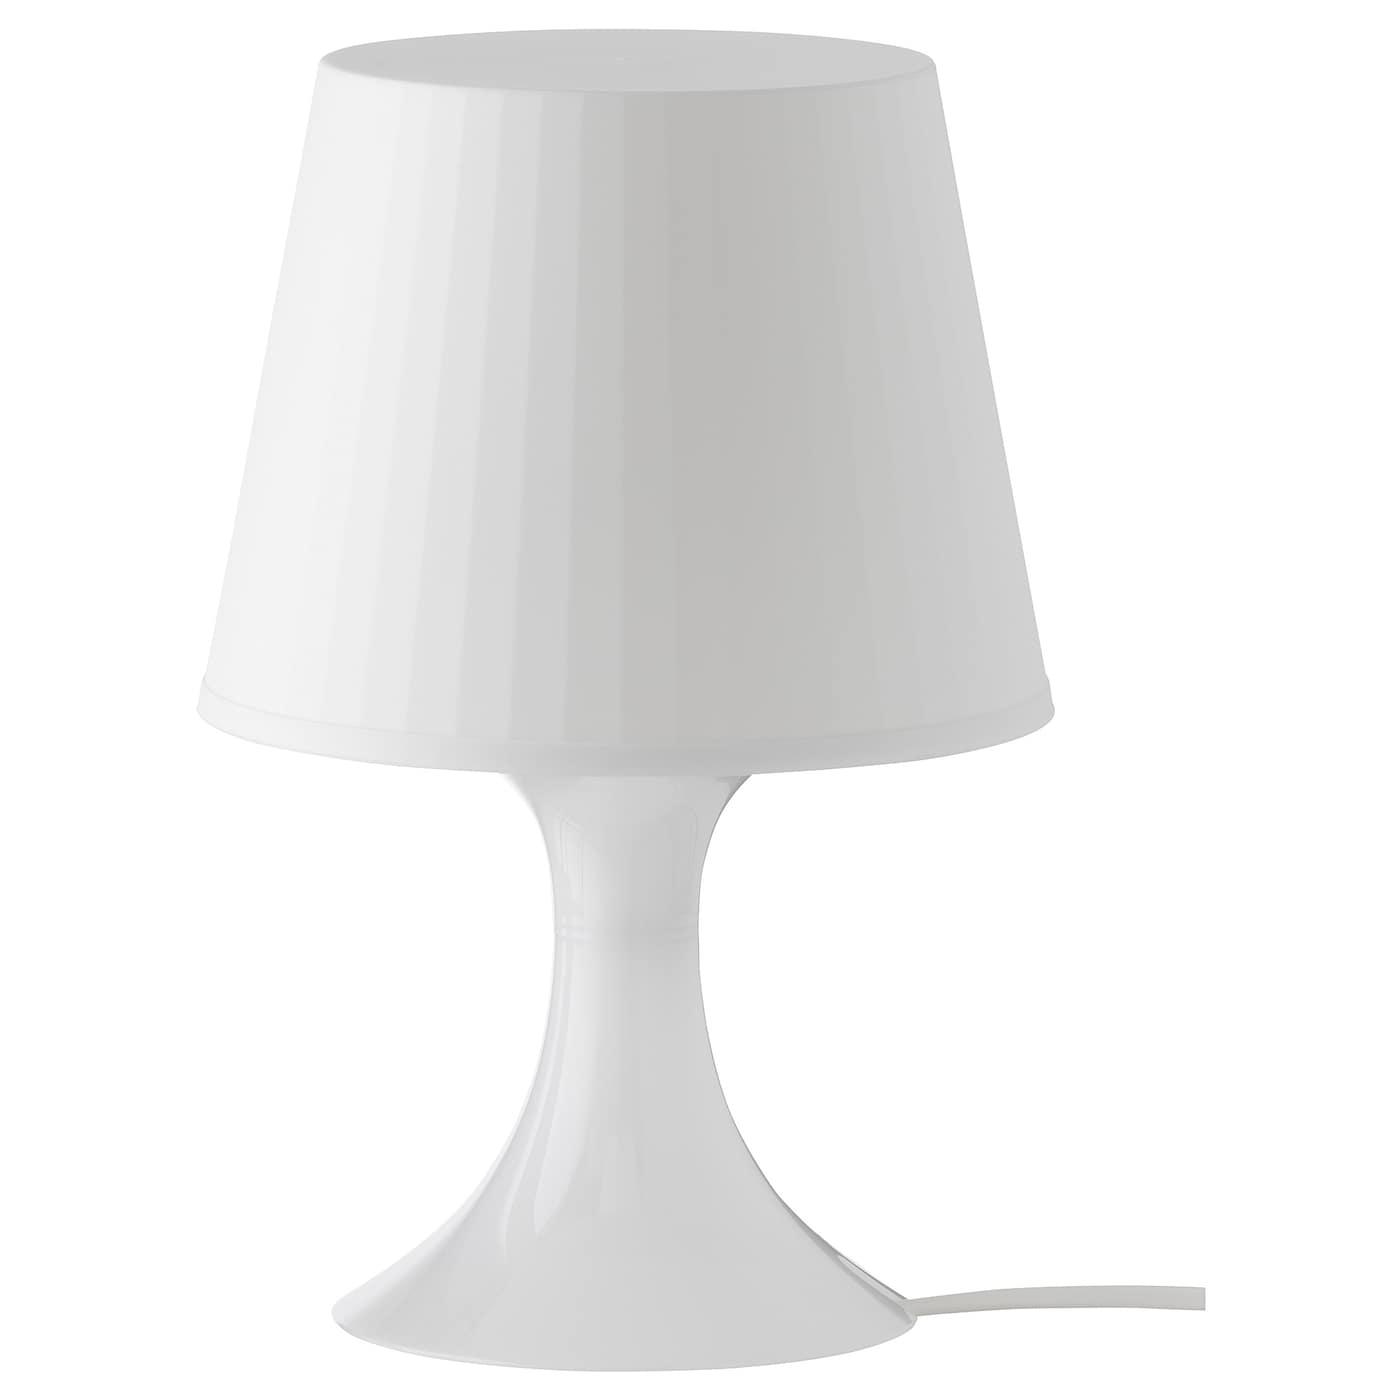 LAMPAN Lampe de table, blanc, 29 cm   IKEA